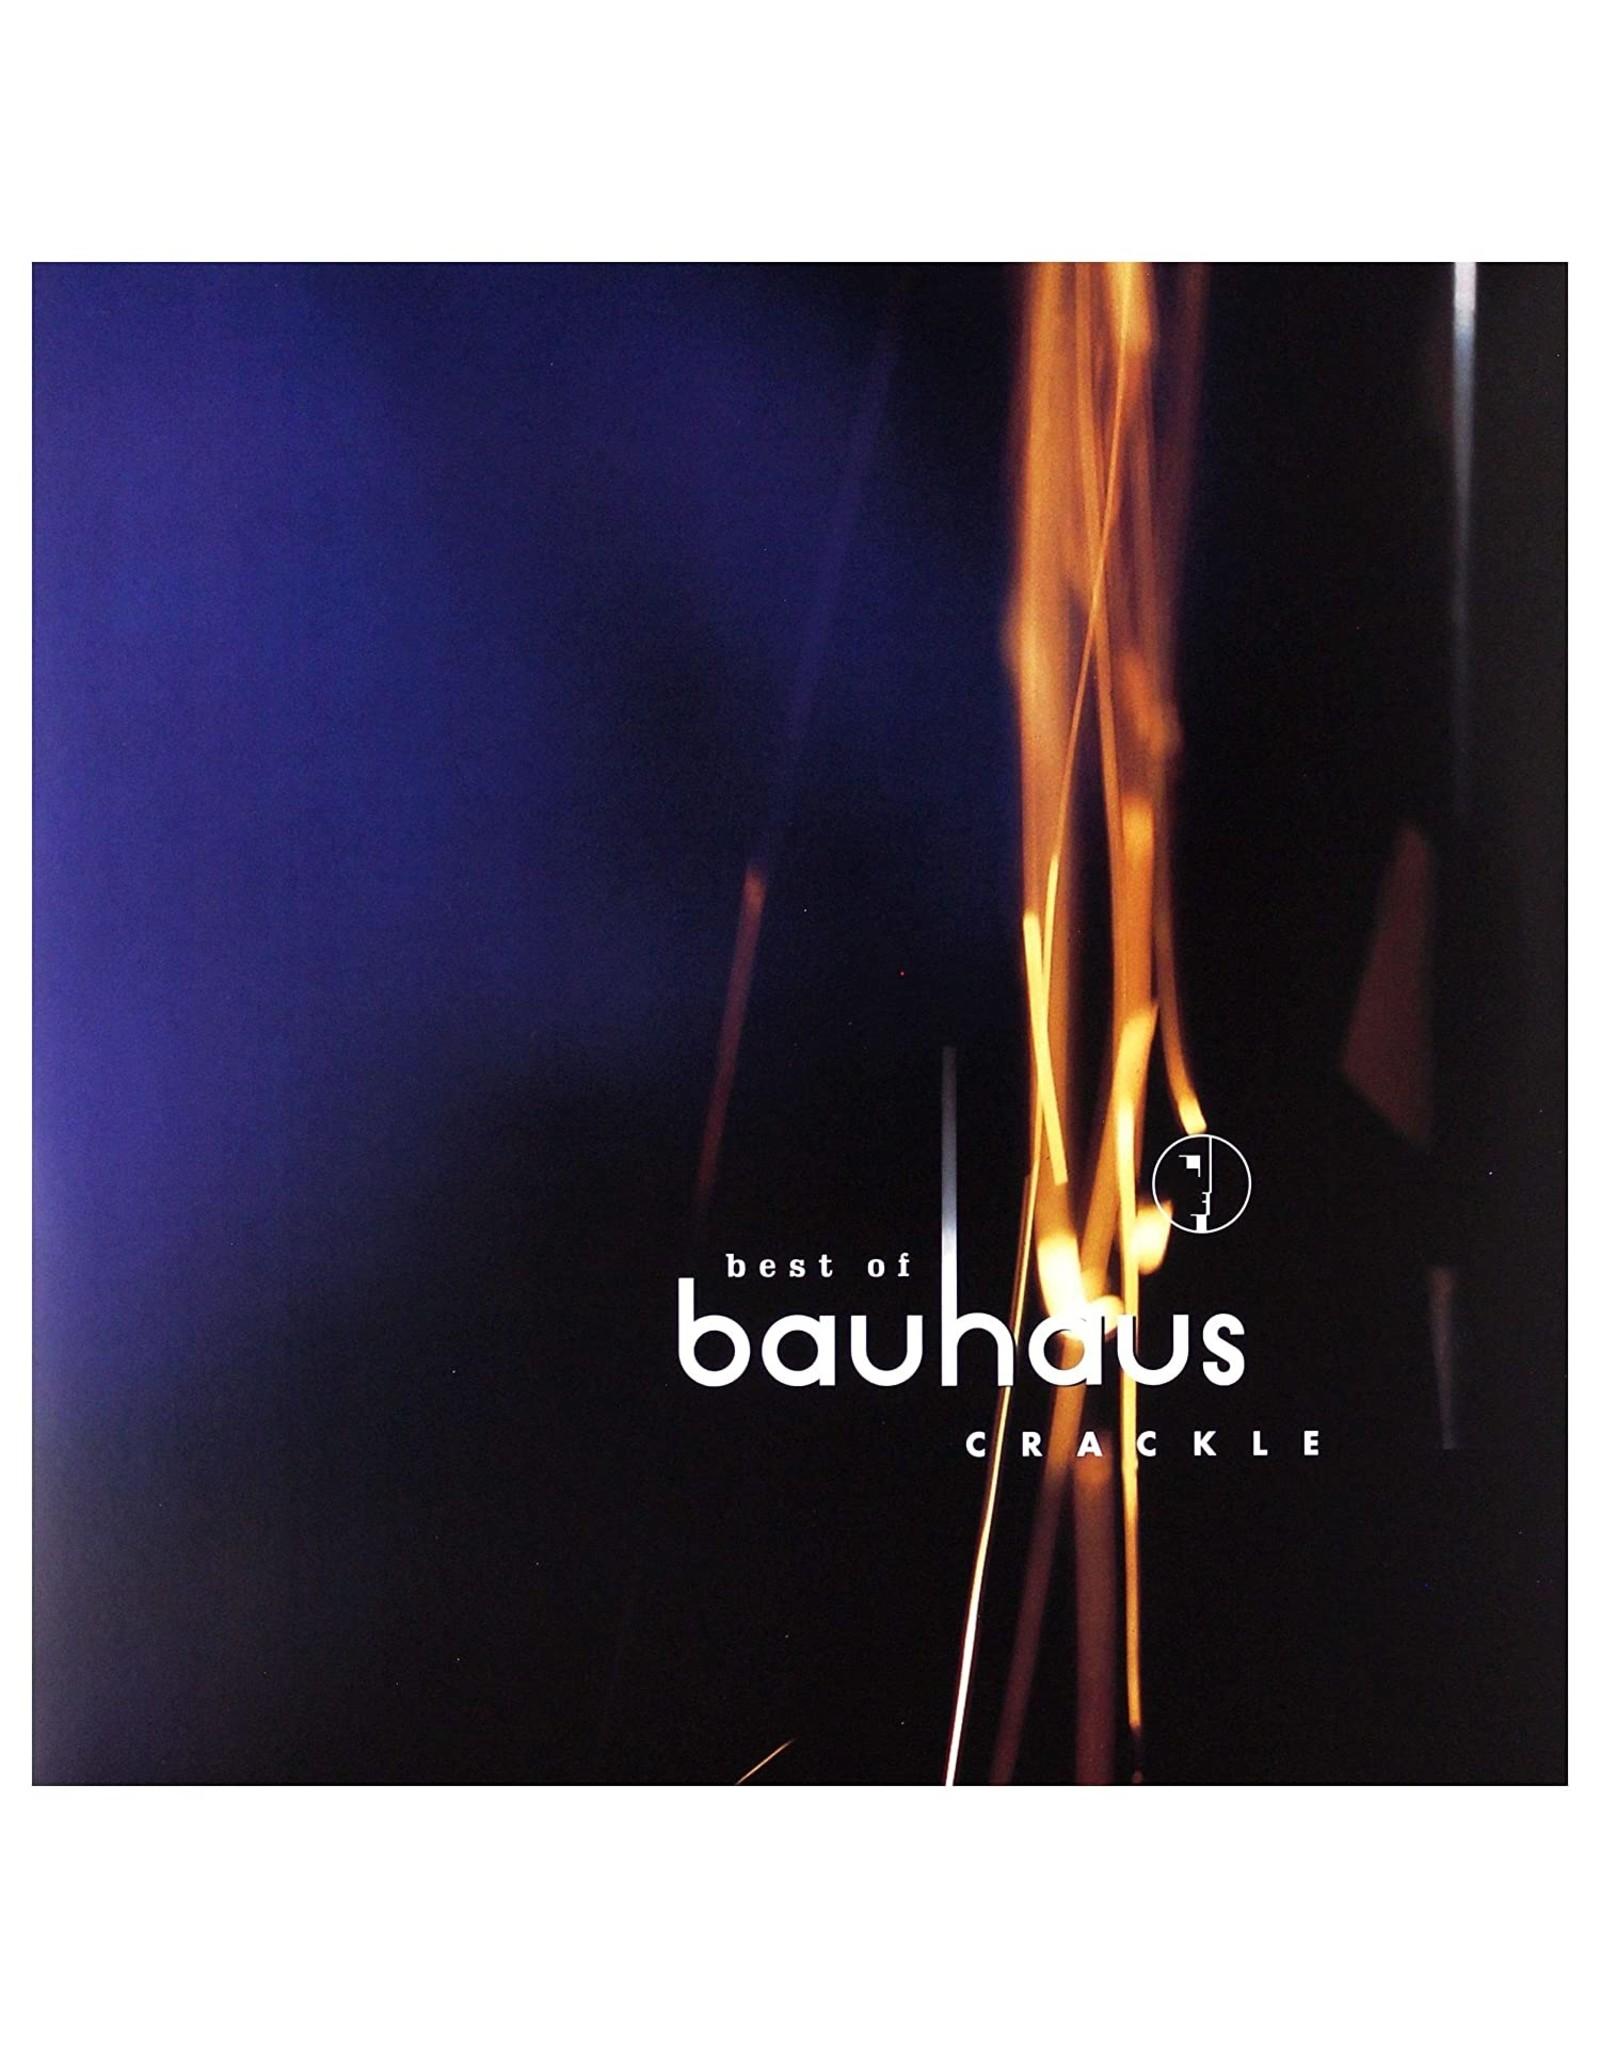 Bauhaus - Crackle - The Best Of (2LP/Limited Edition Ruby Vinyl)